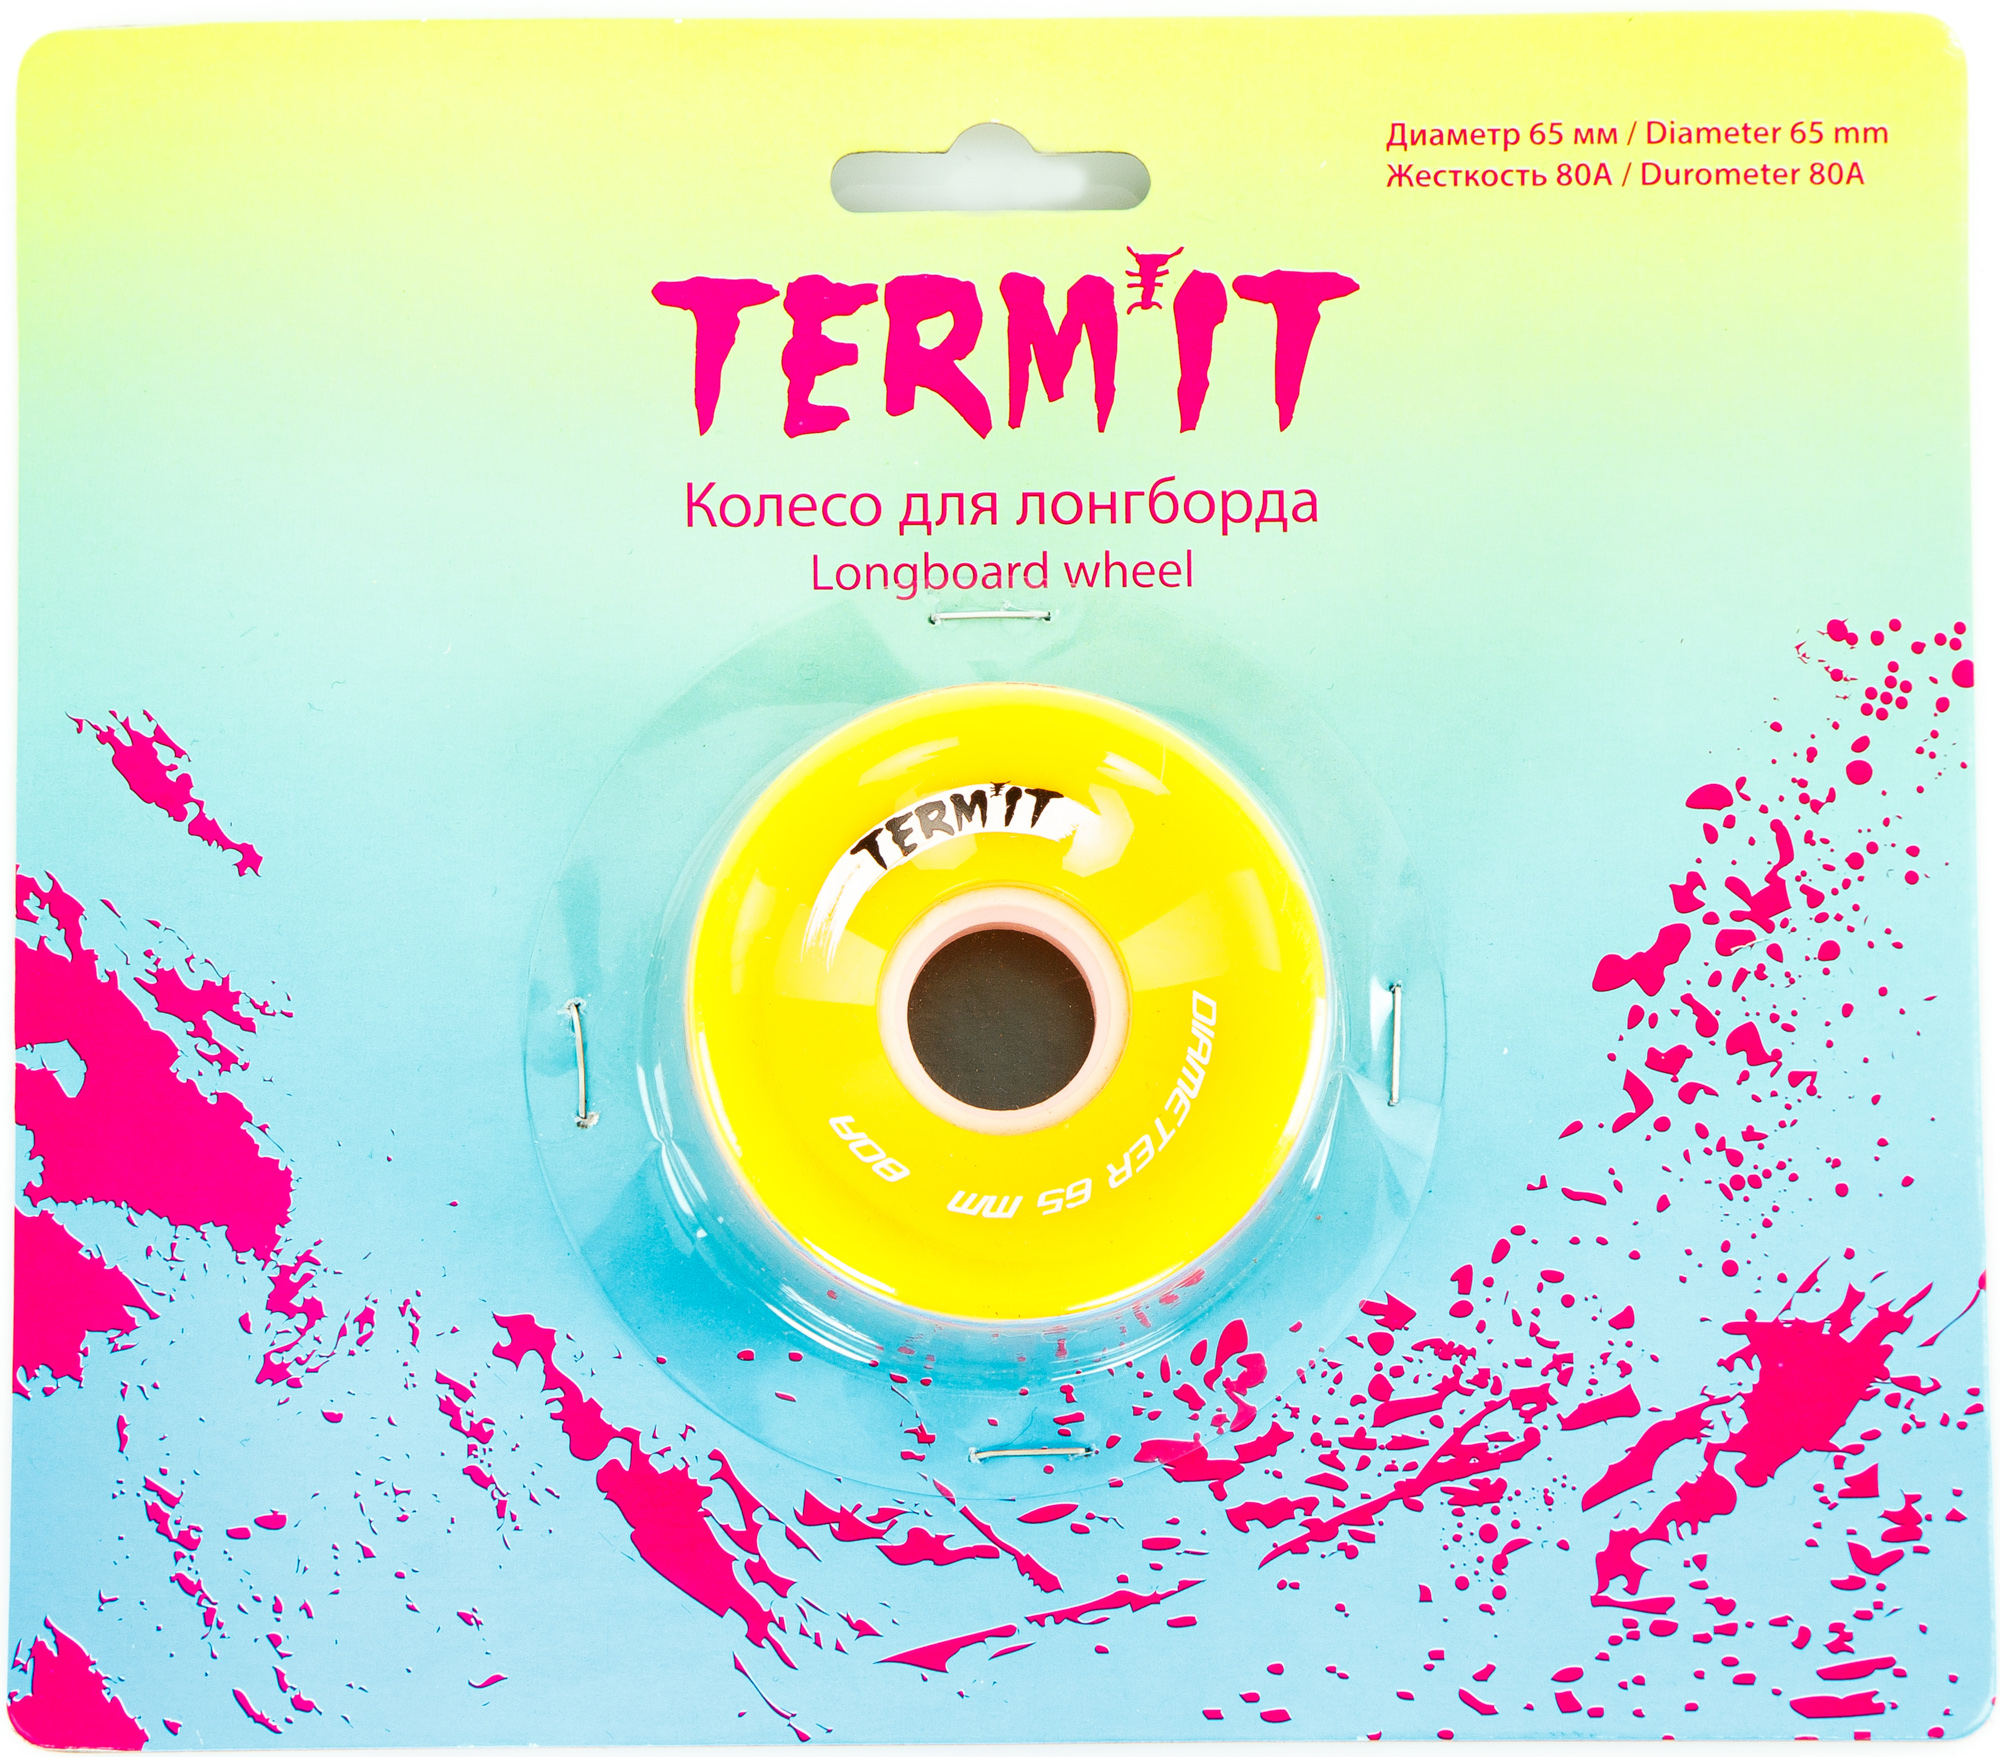 Termit Колесо для лонгборда Termit 65мм, 80А termit колесо для круизера termit 60 мм